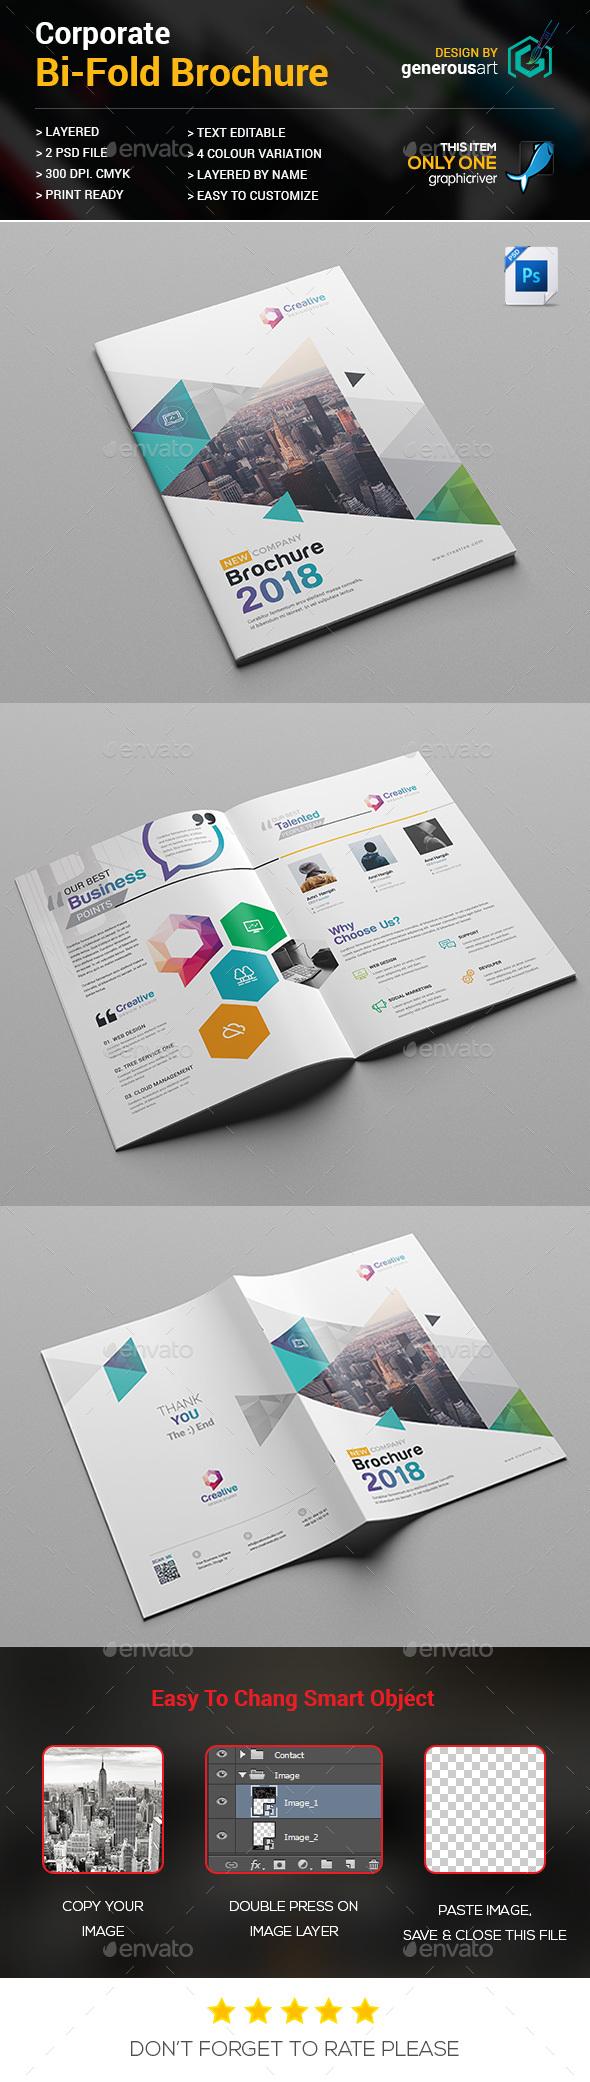 bi fold brochure template by generousart graphicriver. Black Bedroom Furniture Sets. Home Design Ideas